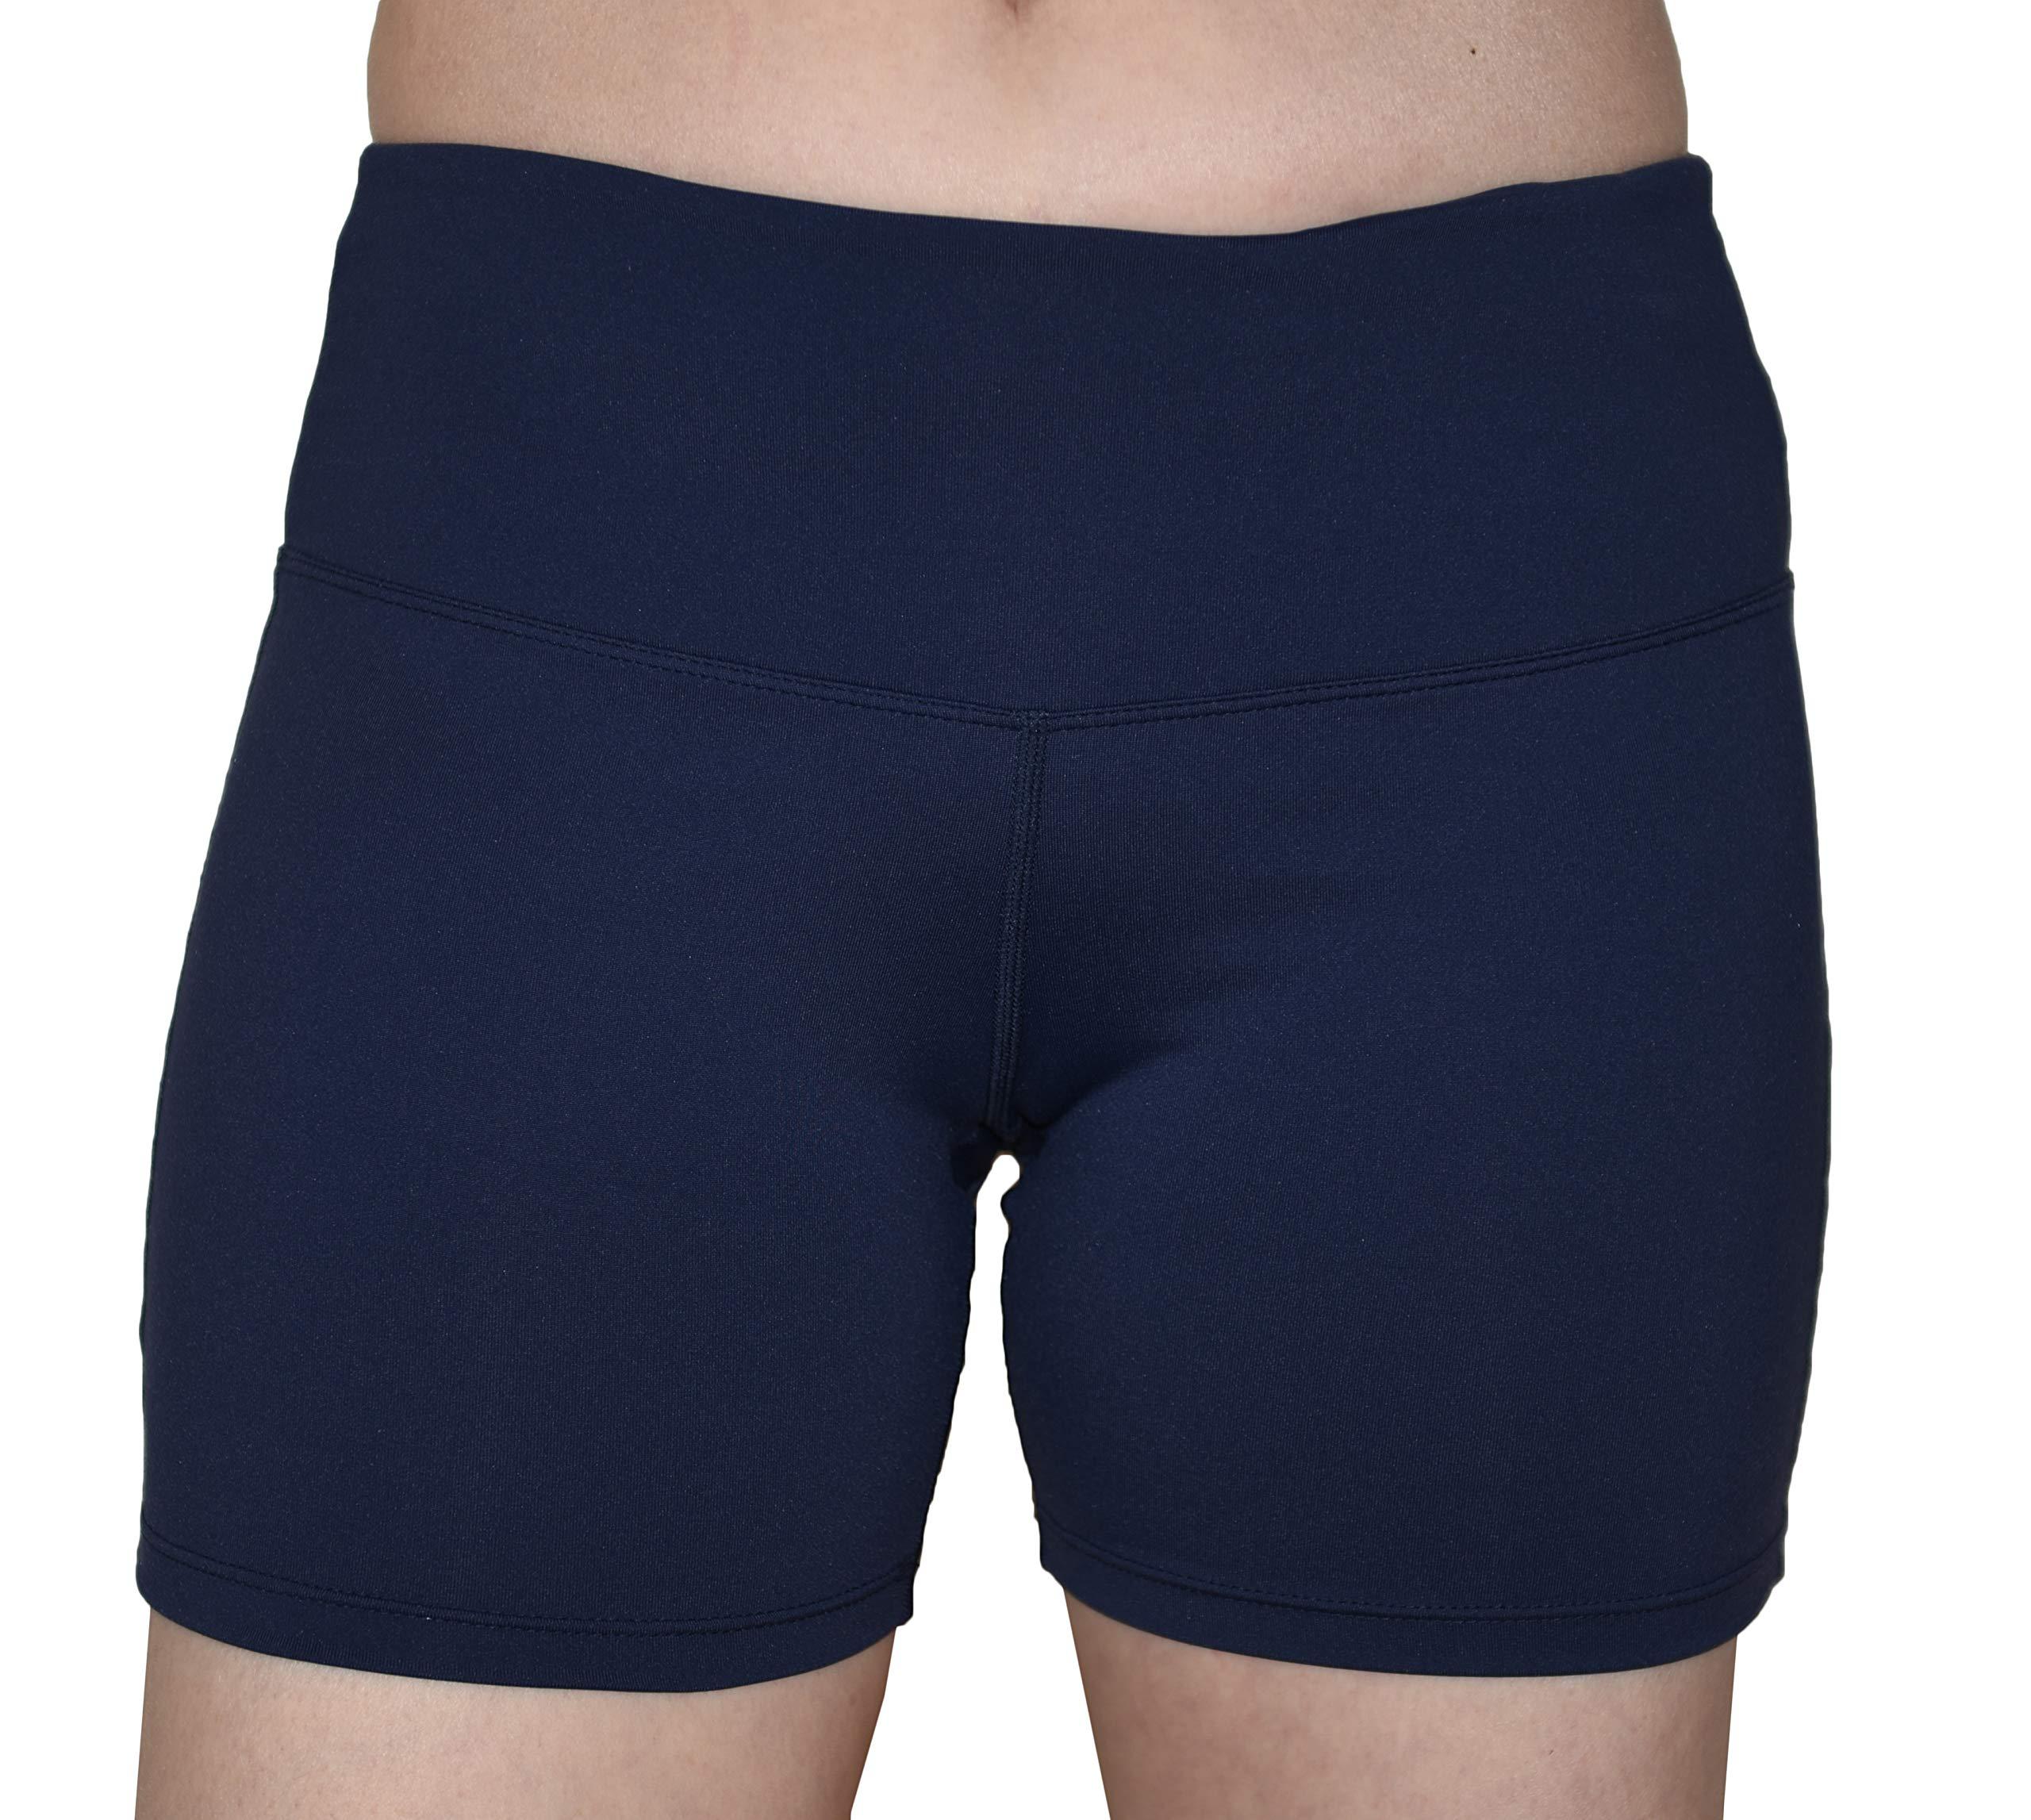 Private Island Women UV Swim Rash Guard Pockets Shorts Pants Yoga (XL, Navy) by Private Island